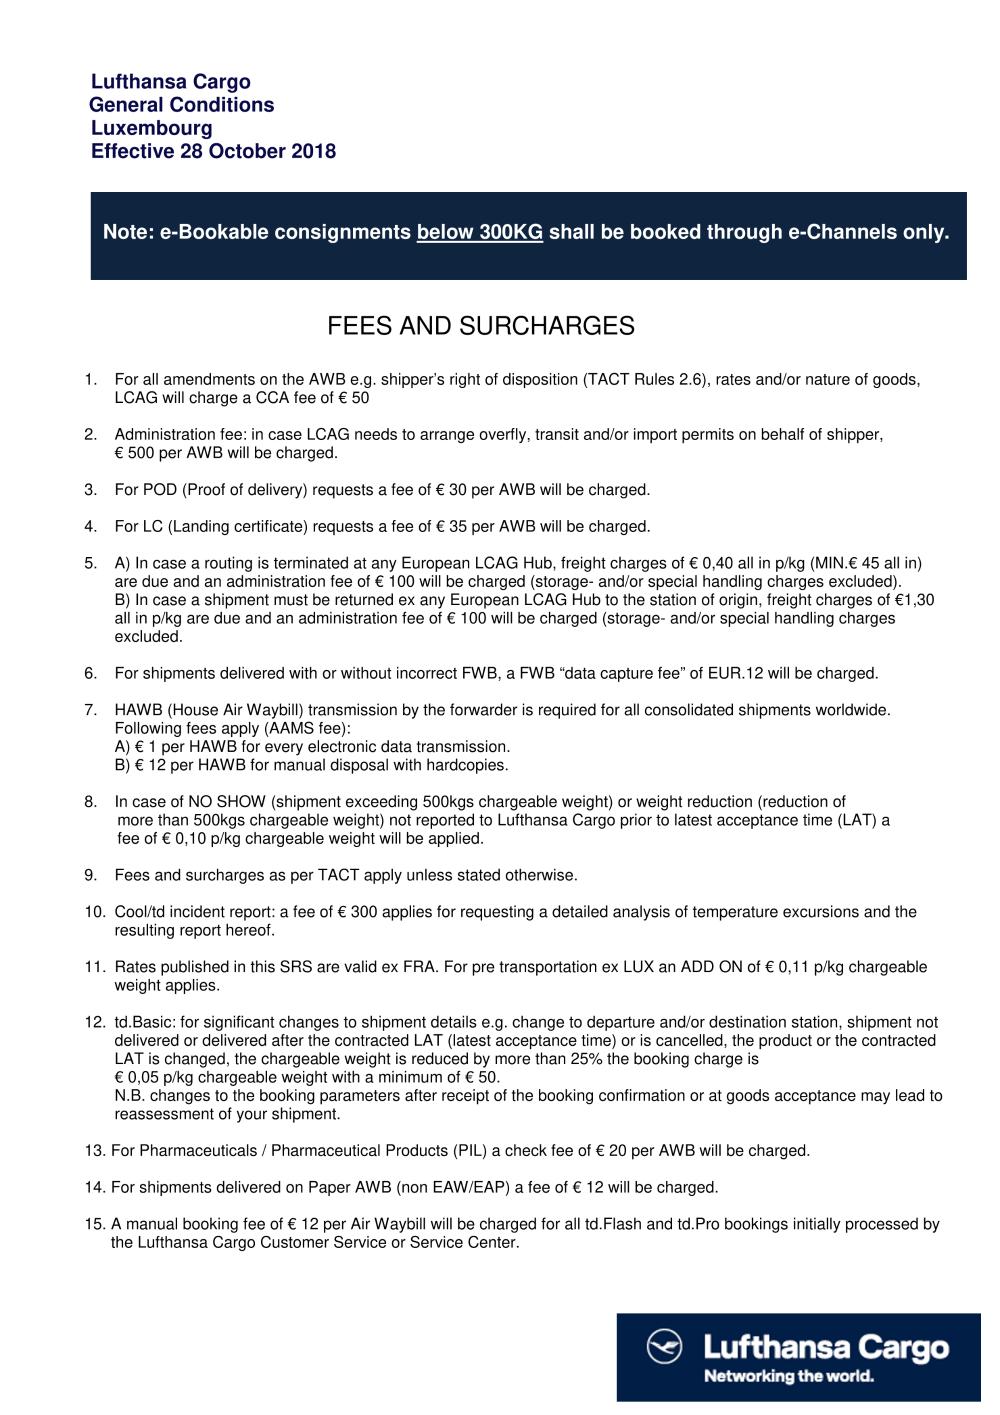 General ConditionsLU_WI2018_2019 pdf - searchresult